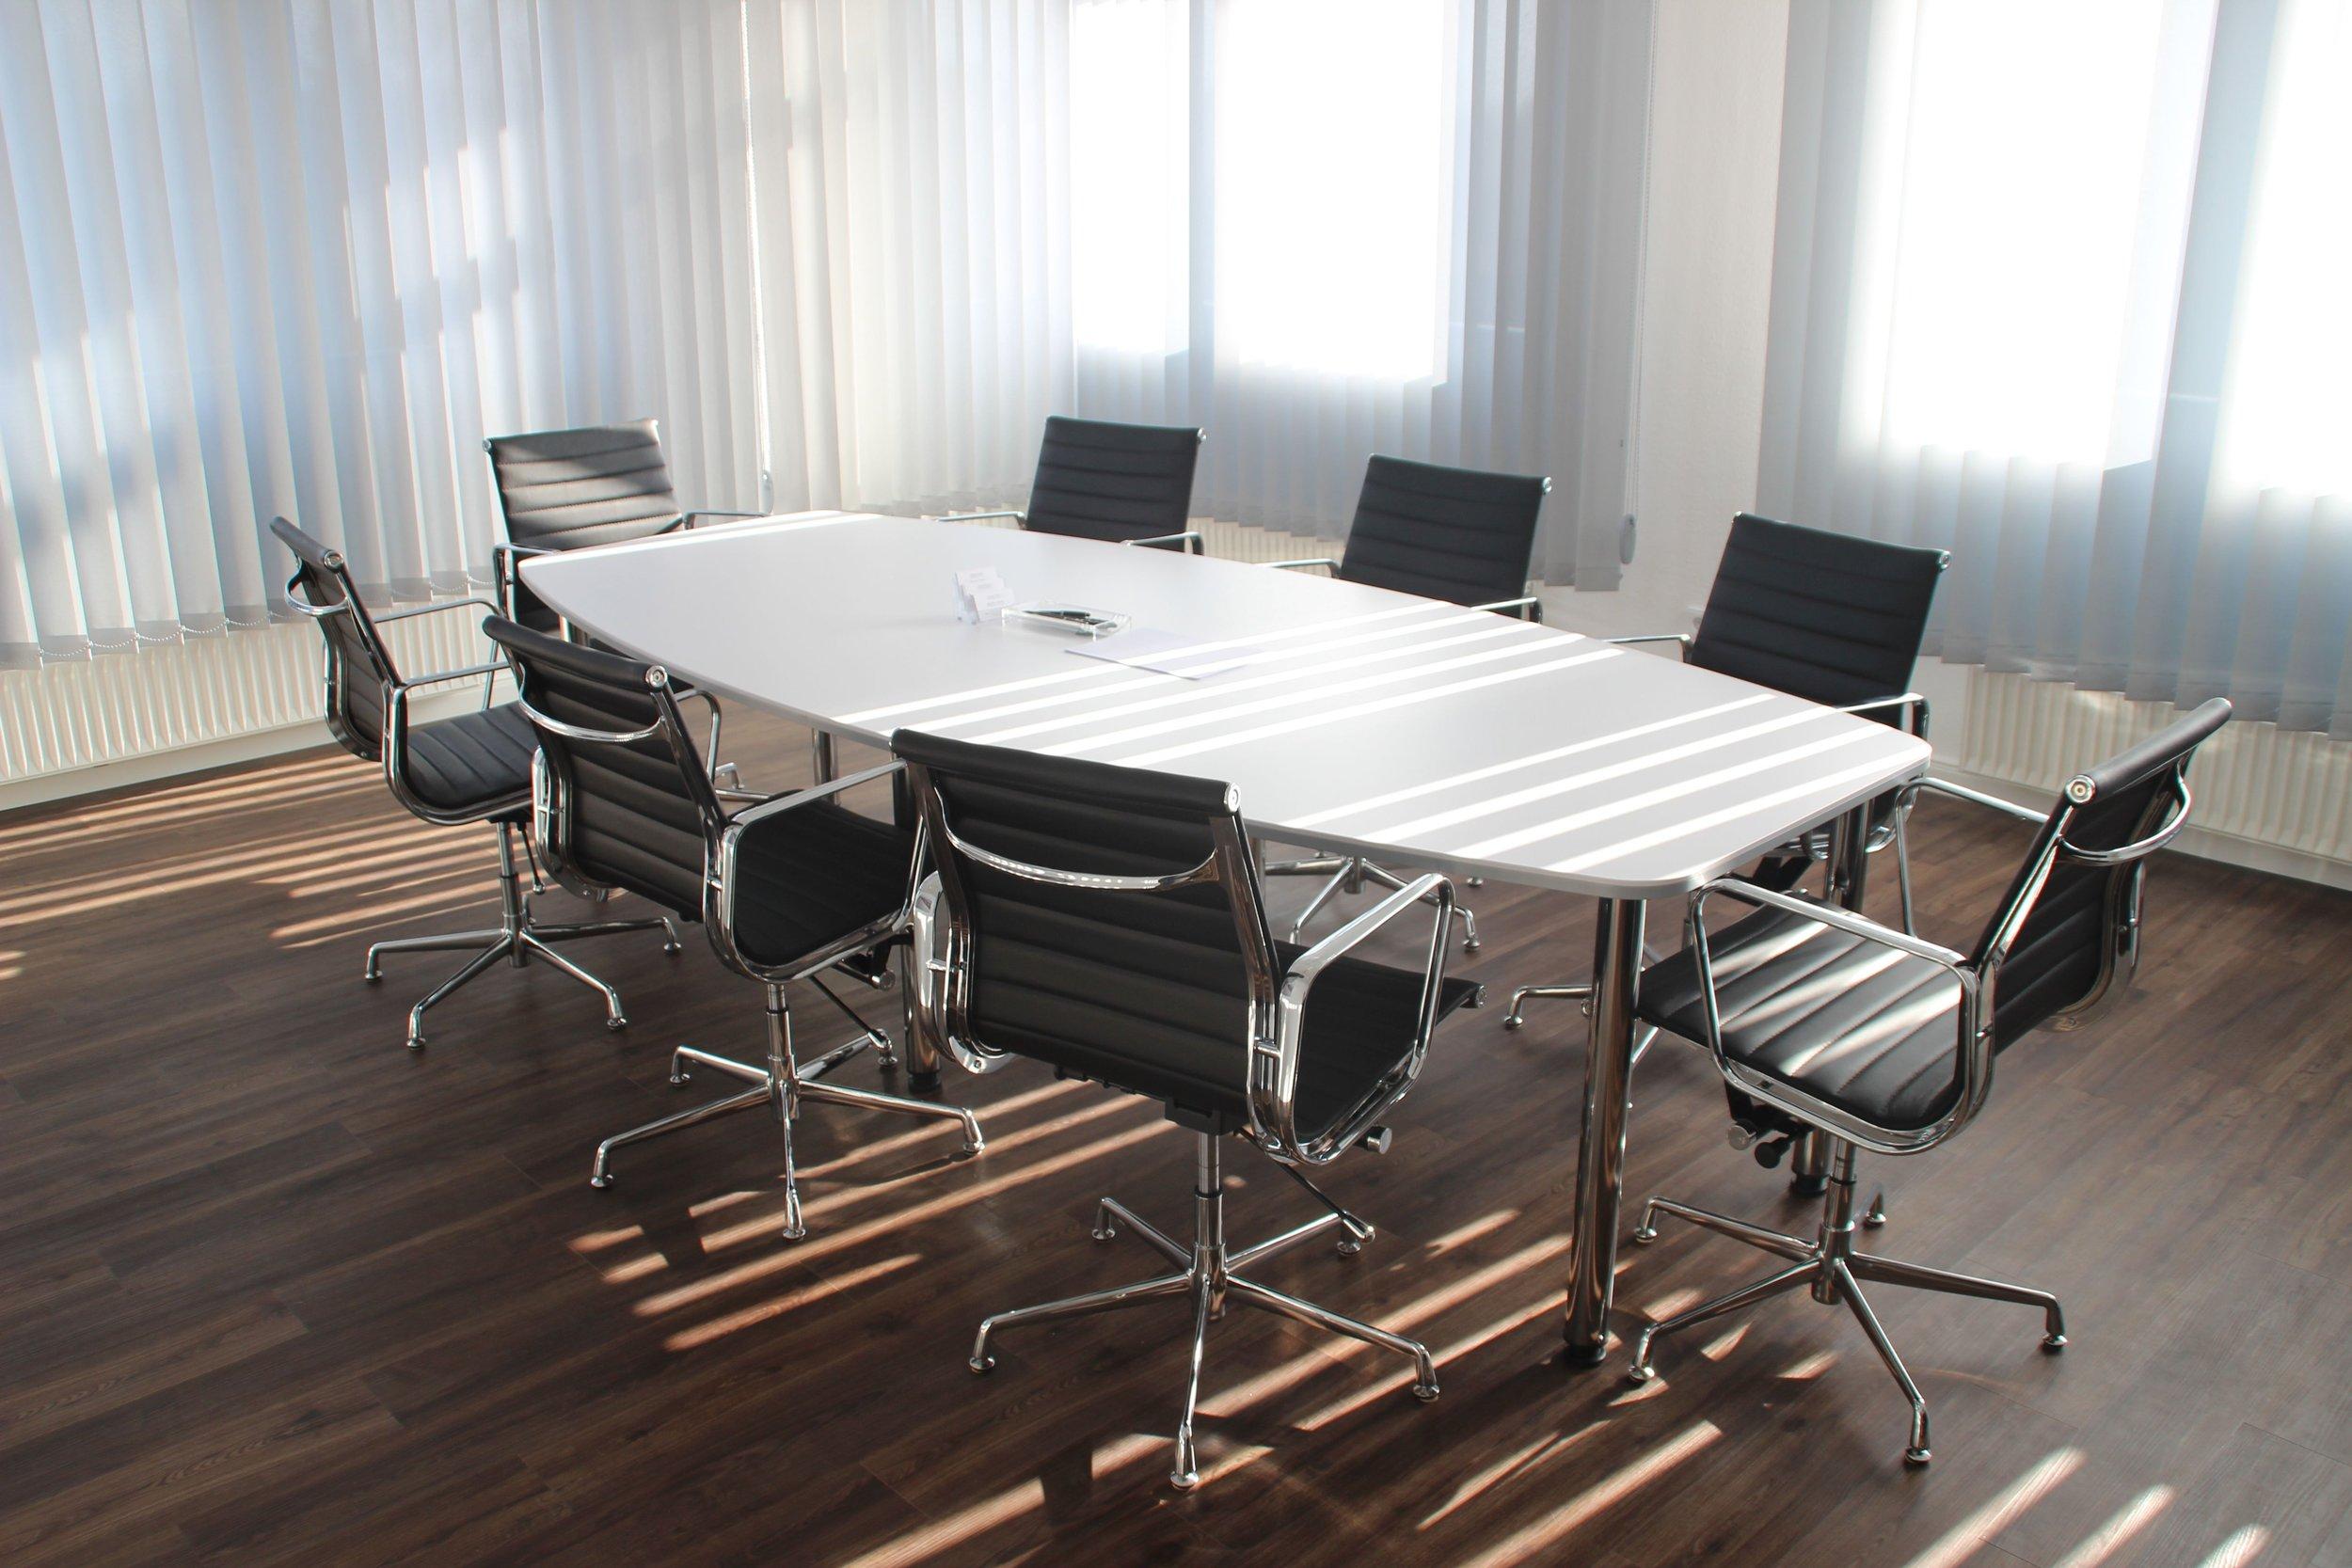 chairs-contemporary-designer-416320.jpg